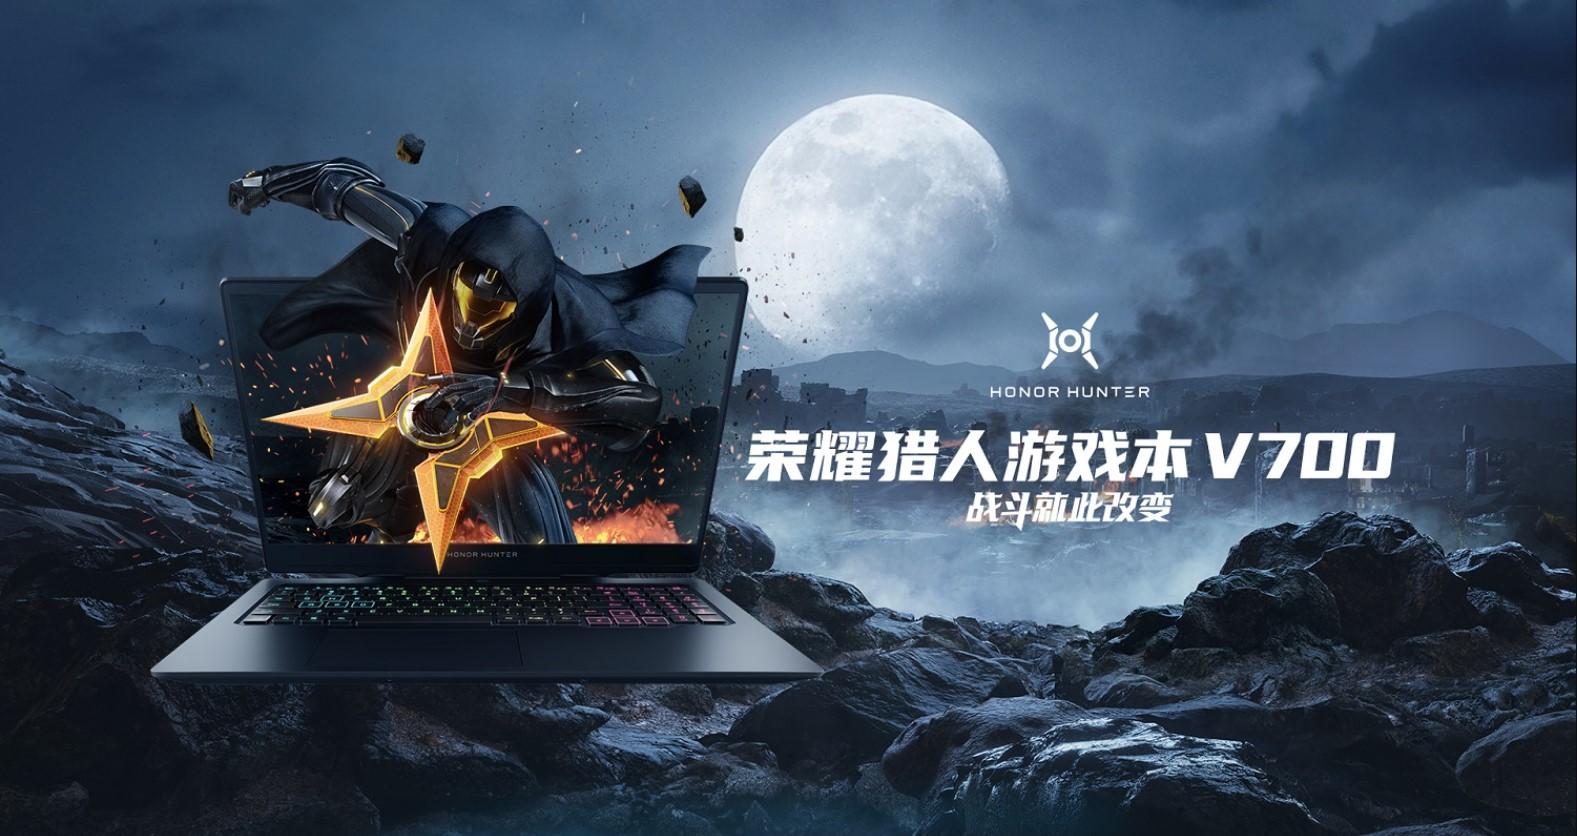 Honor Hunter V700: cómo es la primera laptop gamer de la marca china